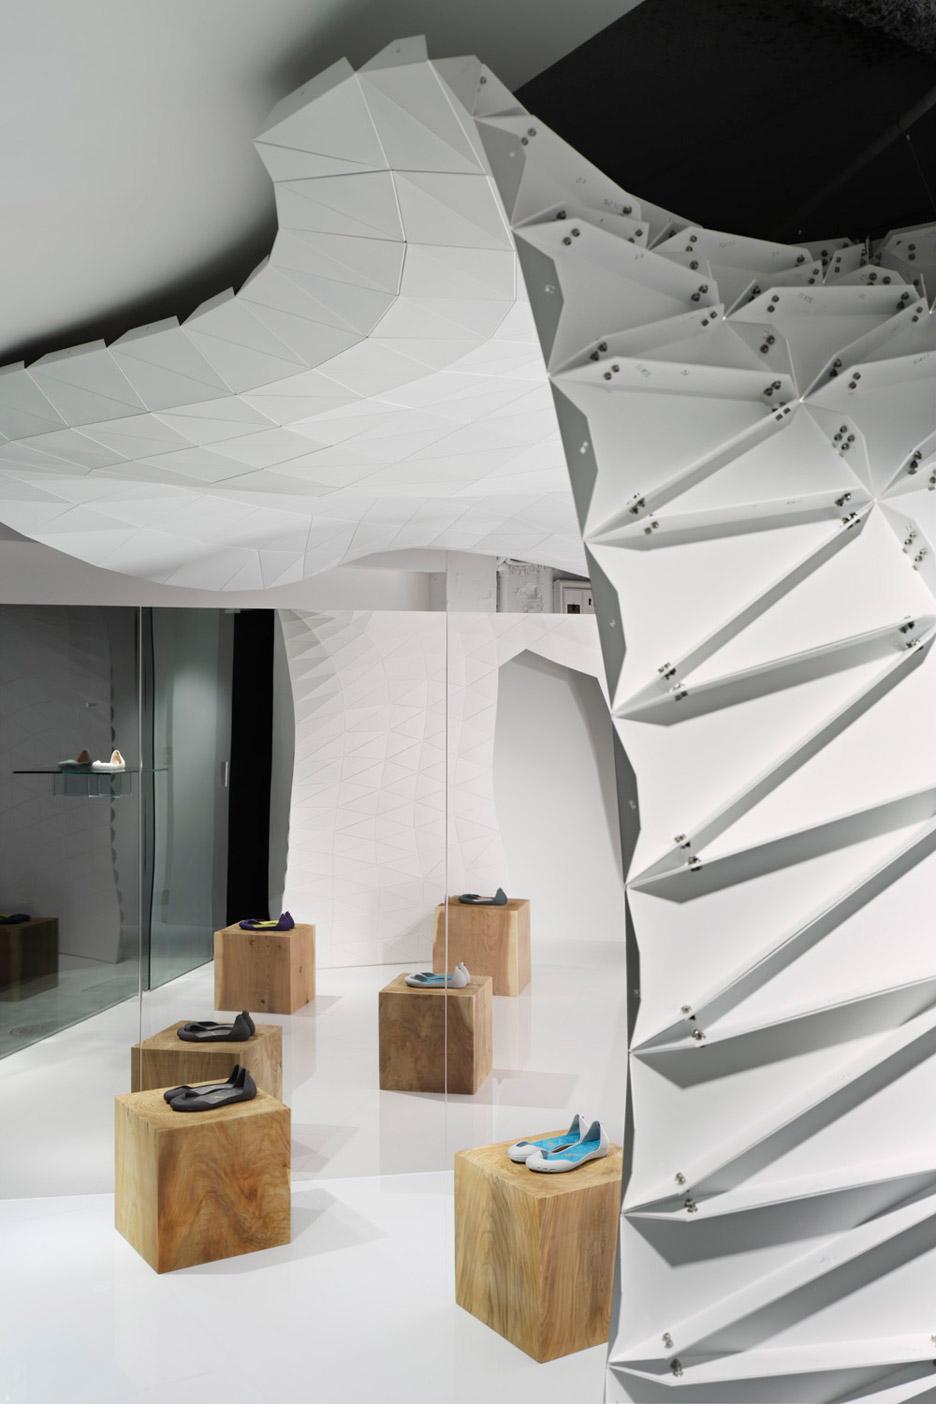 Soichi Mizutani designs Iguaneye Tokyo shoe store as a faceted white cave